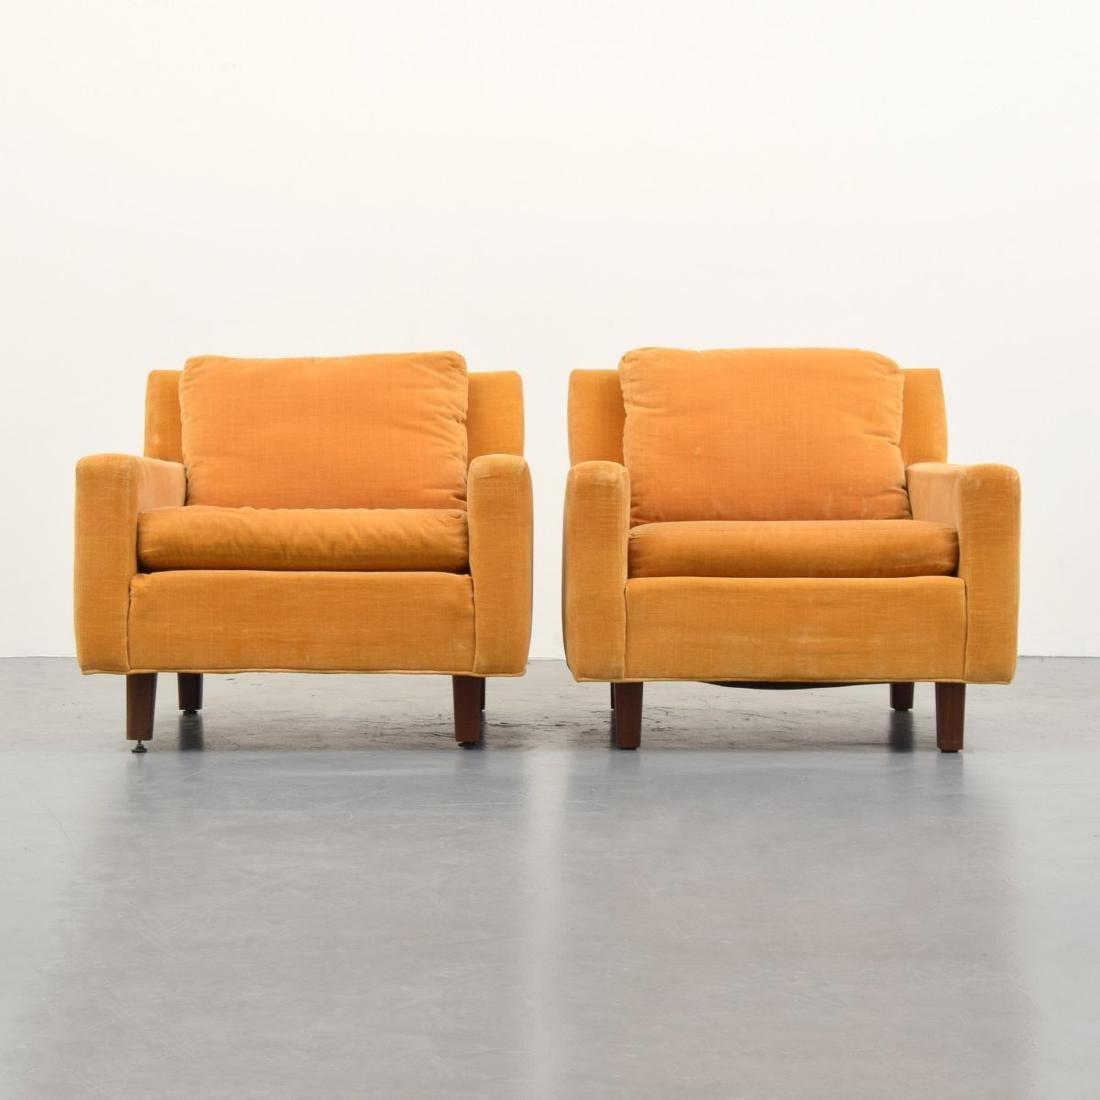 Pair of Milo Baughman Lounge Chairs - 2